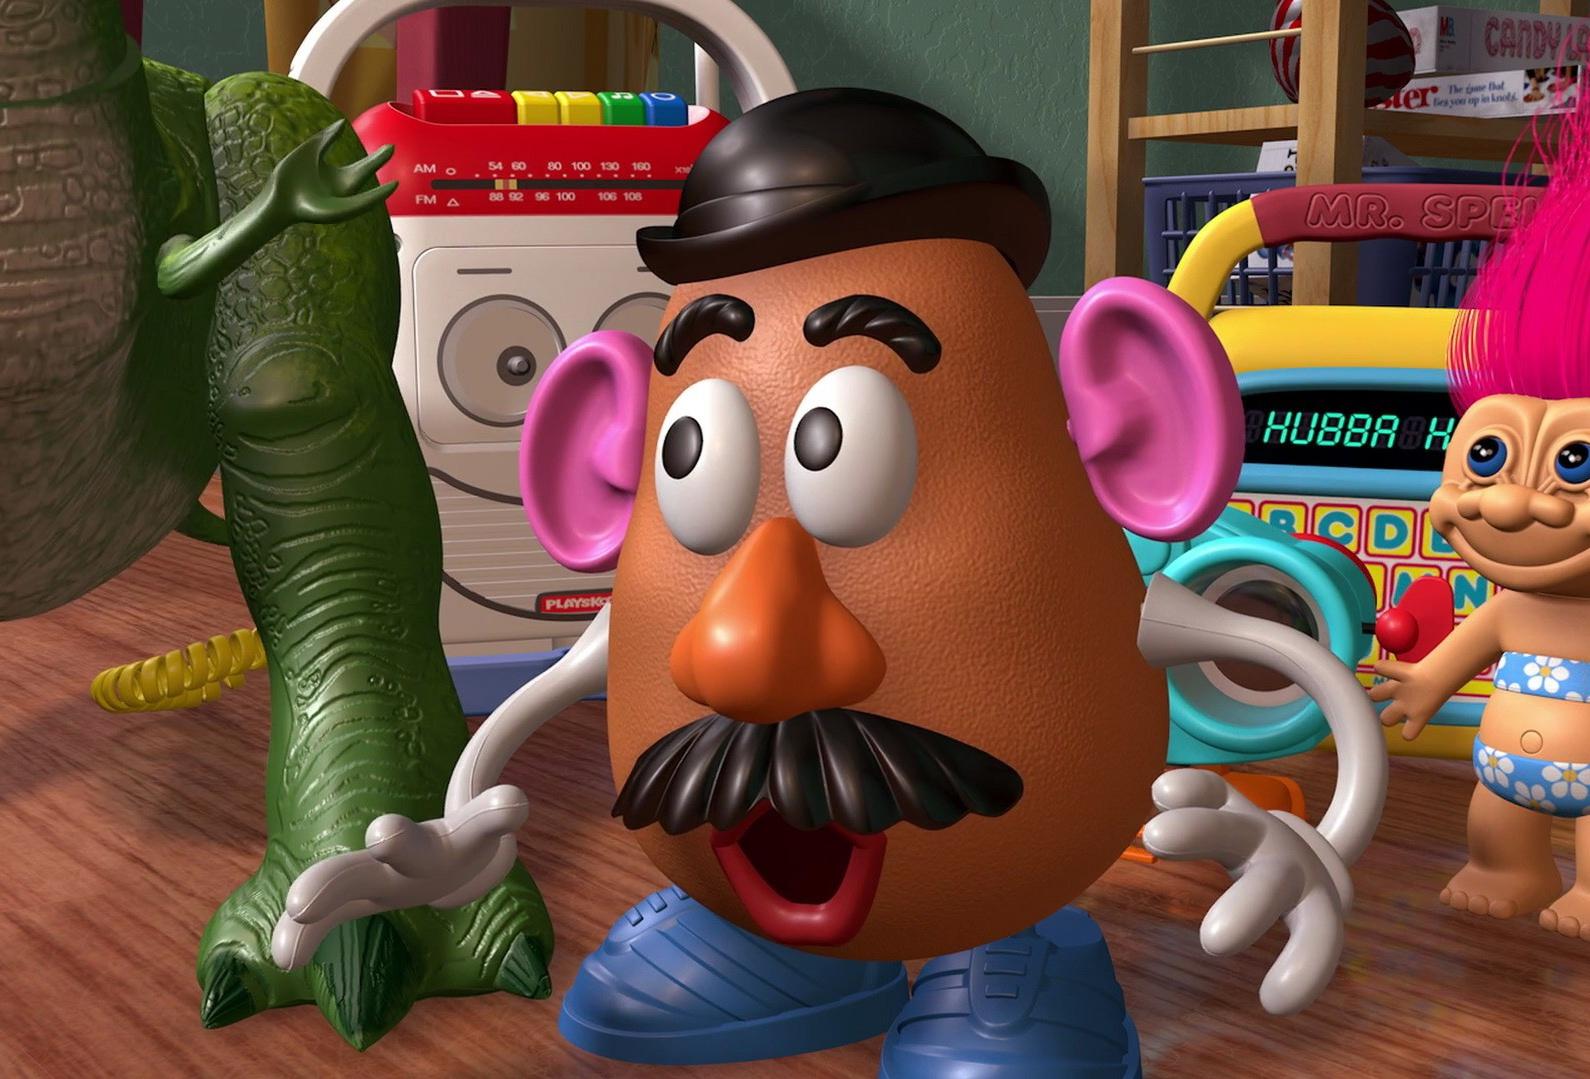 Mr Potato Head Pixar Wiki Disney Pixar Animation Studios